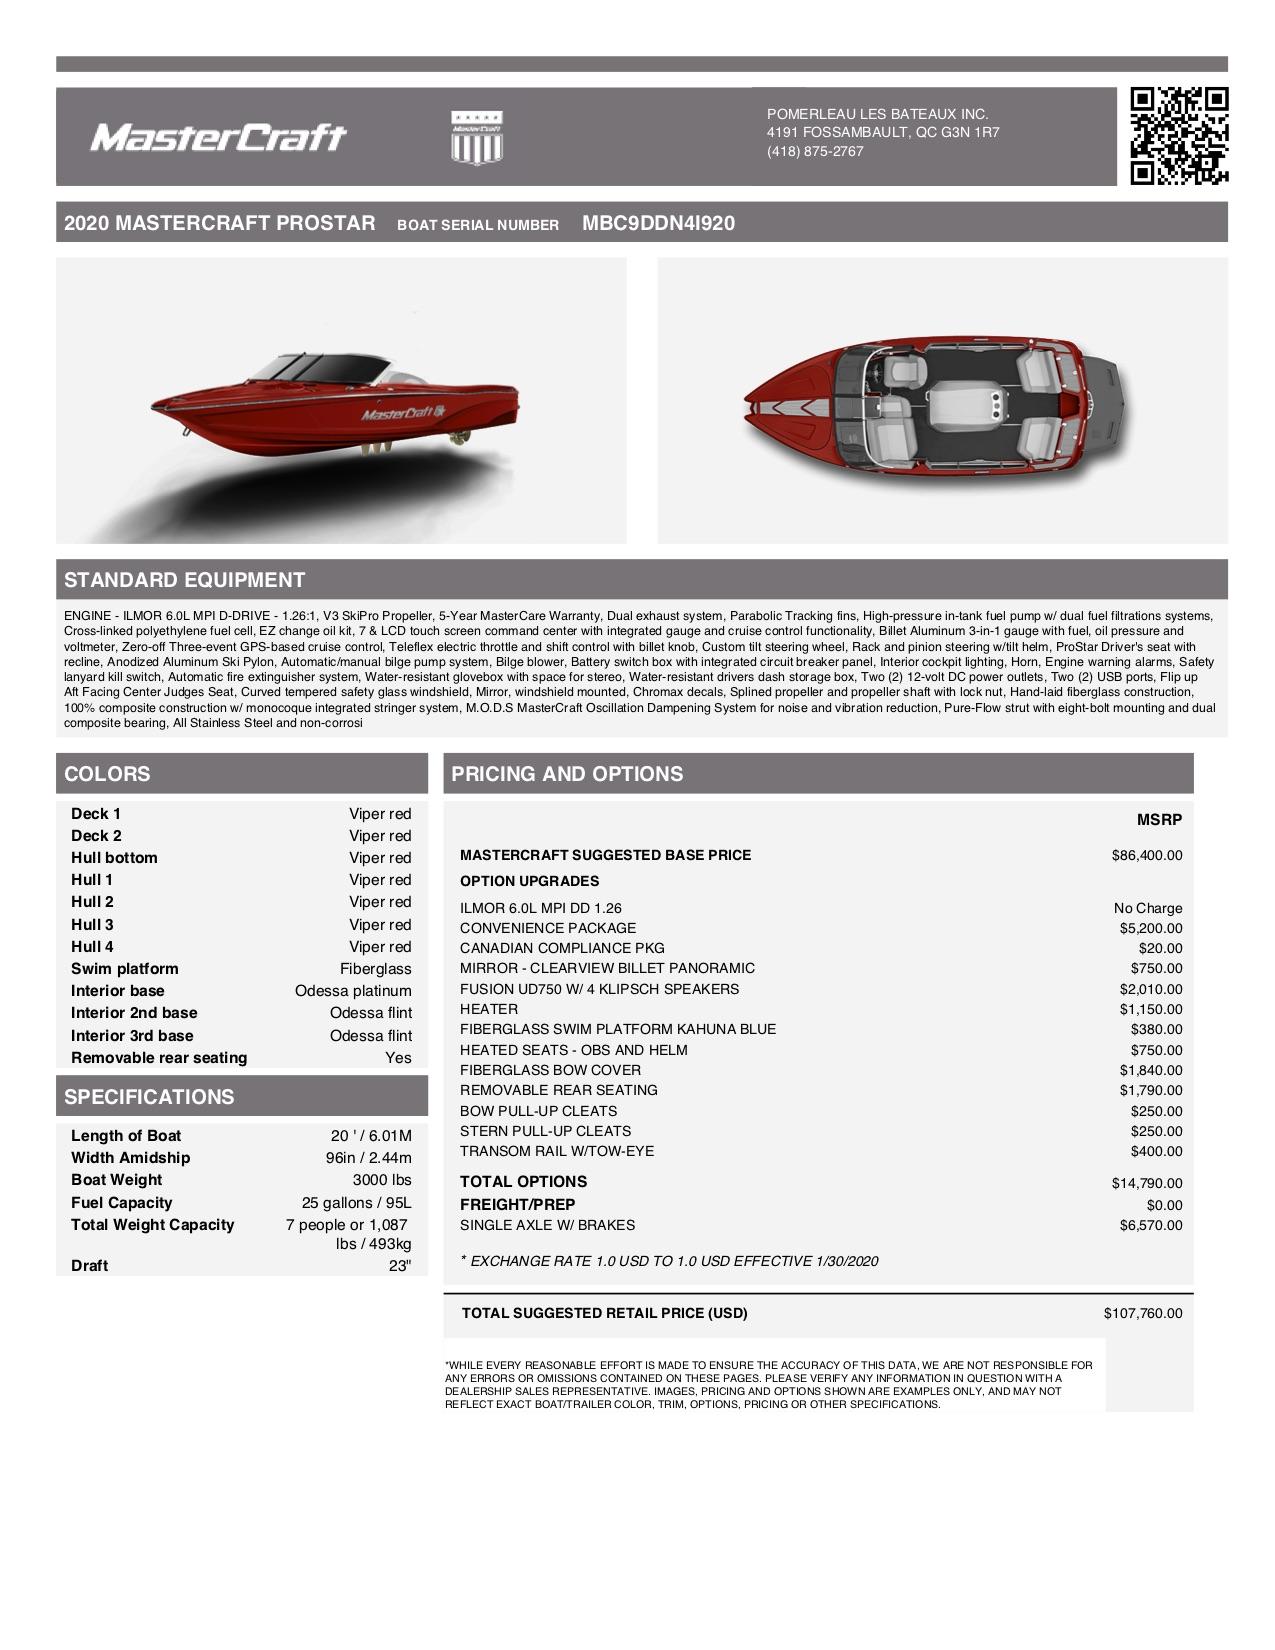 Mastercraft Prostar - PROSTAR VIPER REDmsrp_MBC9DDN4I920